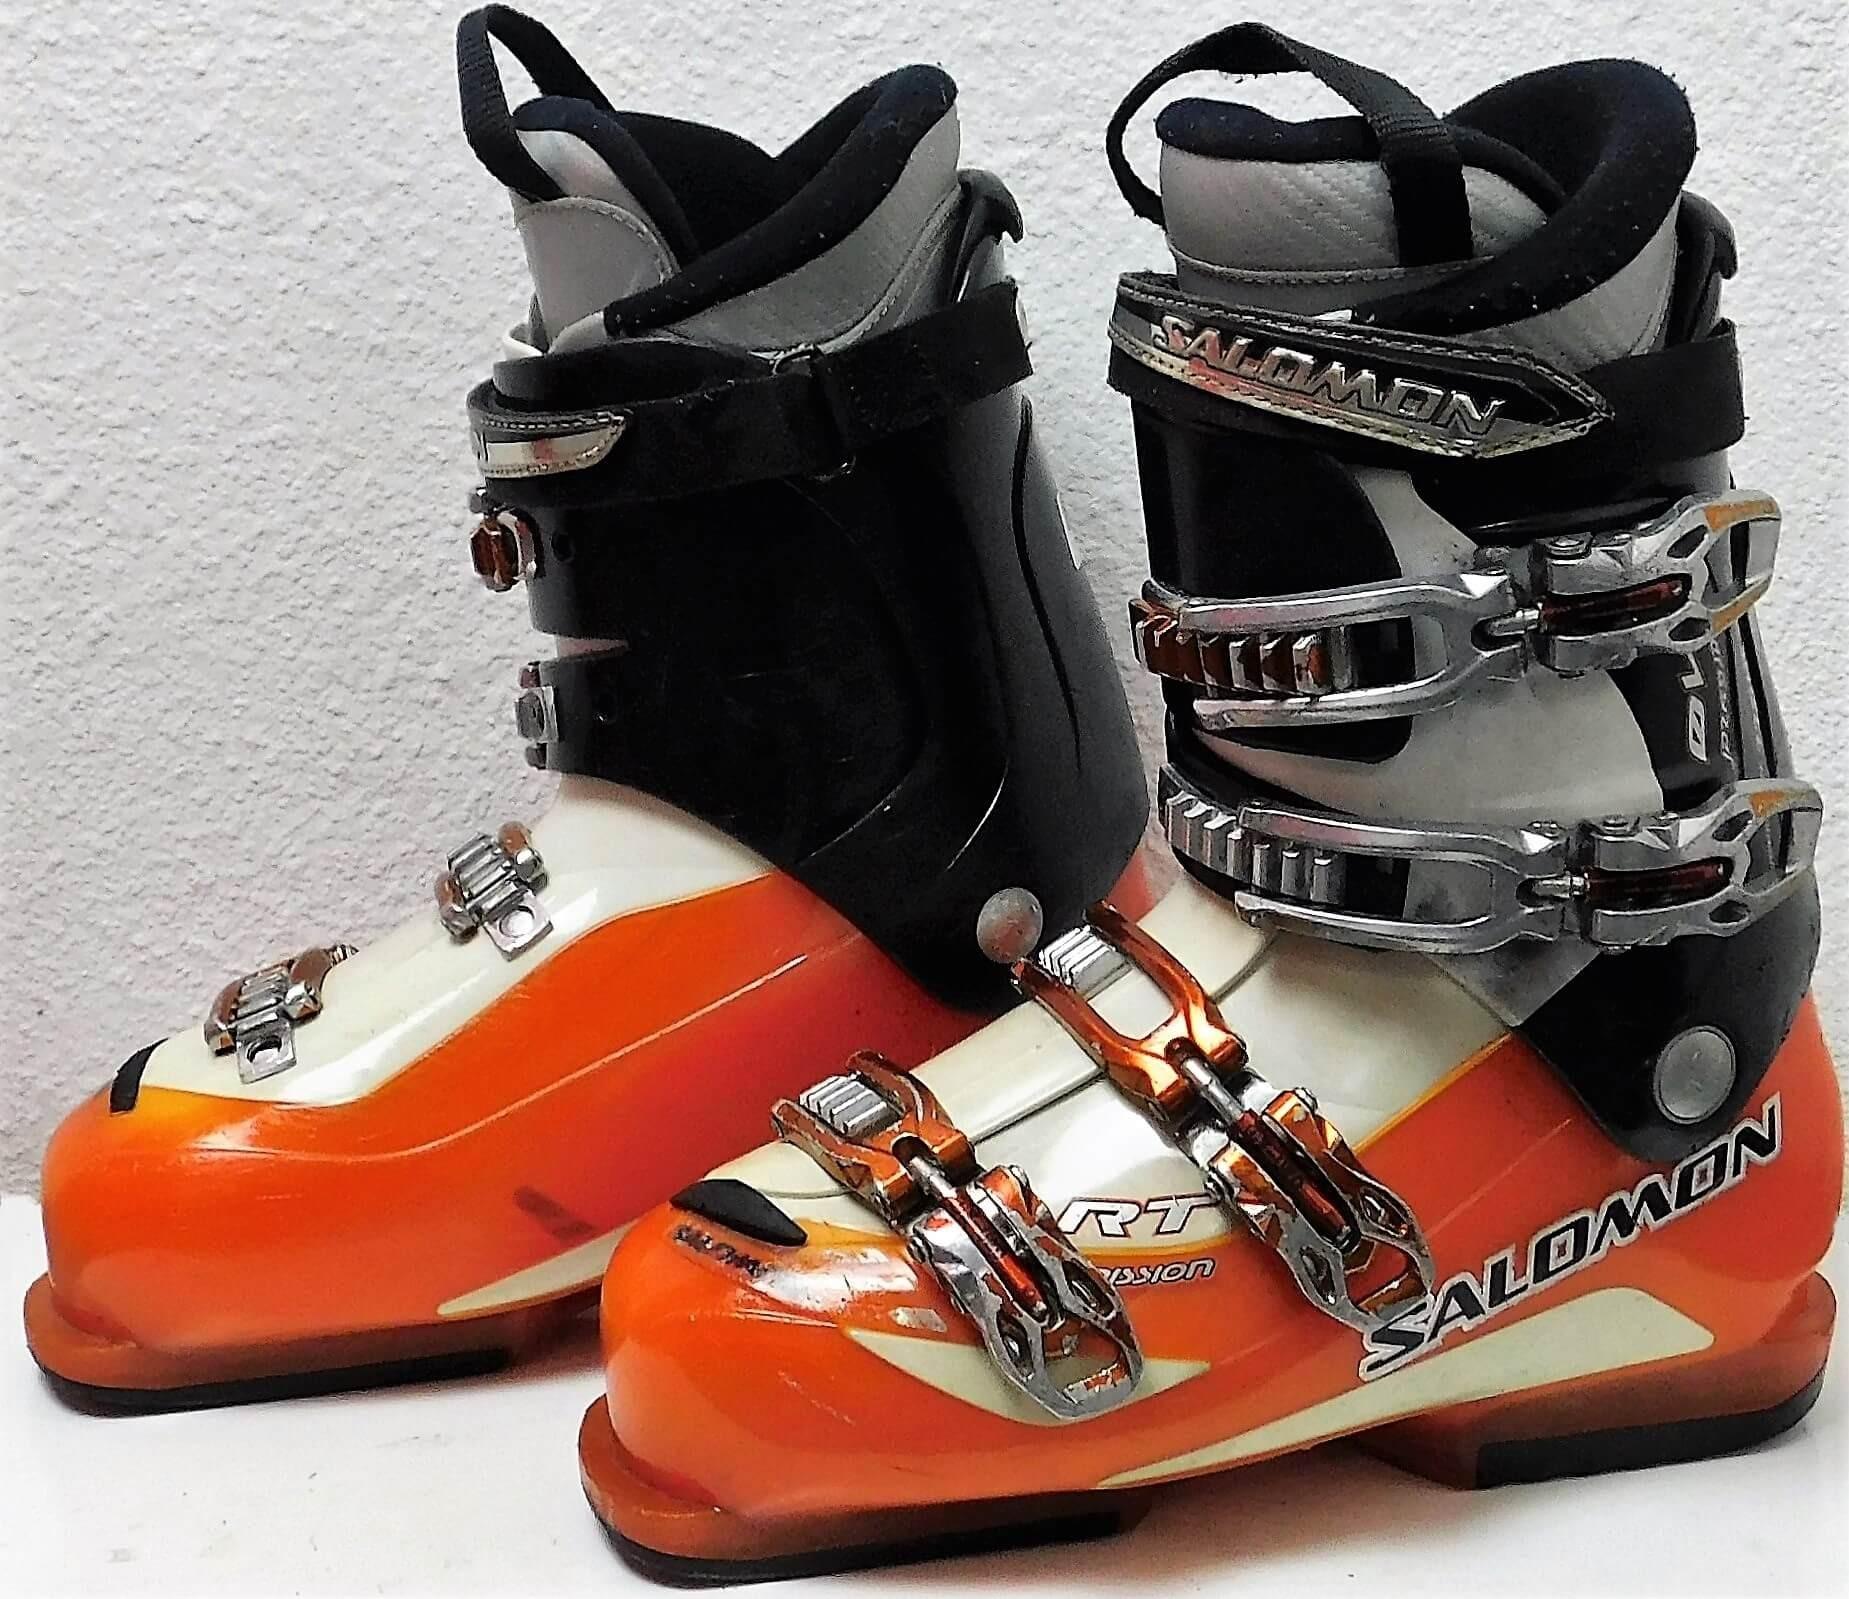 a2f345716d0f Chaussure De Ski Salomon Mission RT - SkiOccas